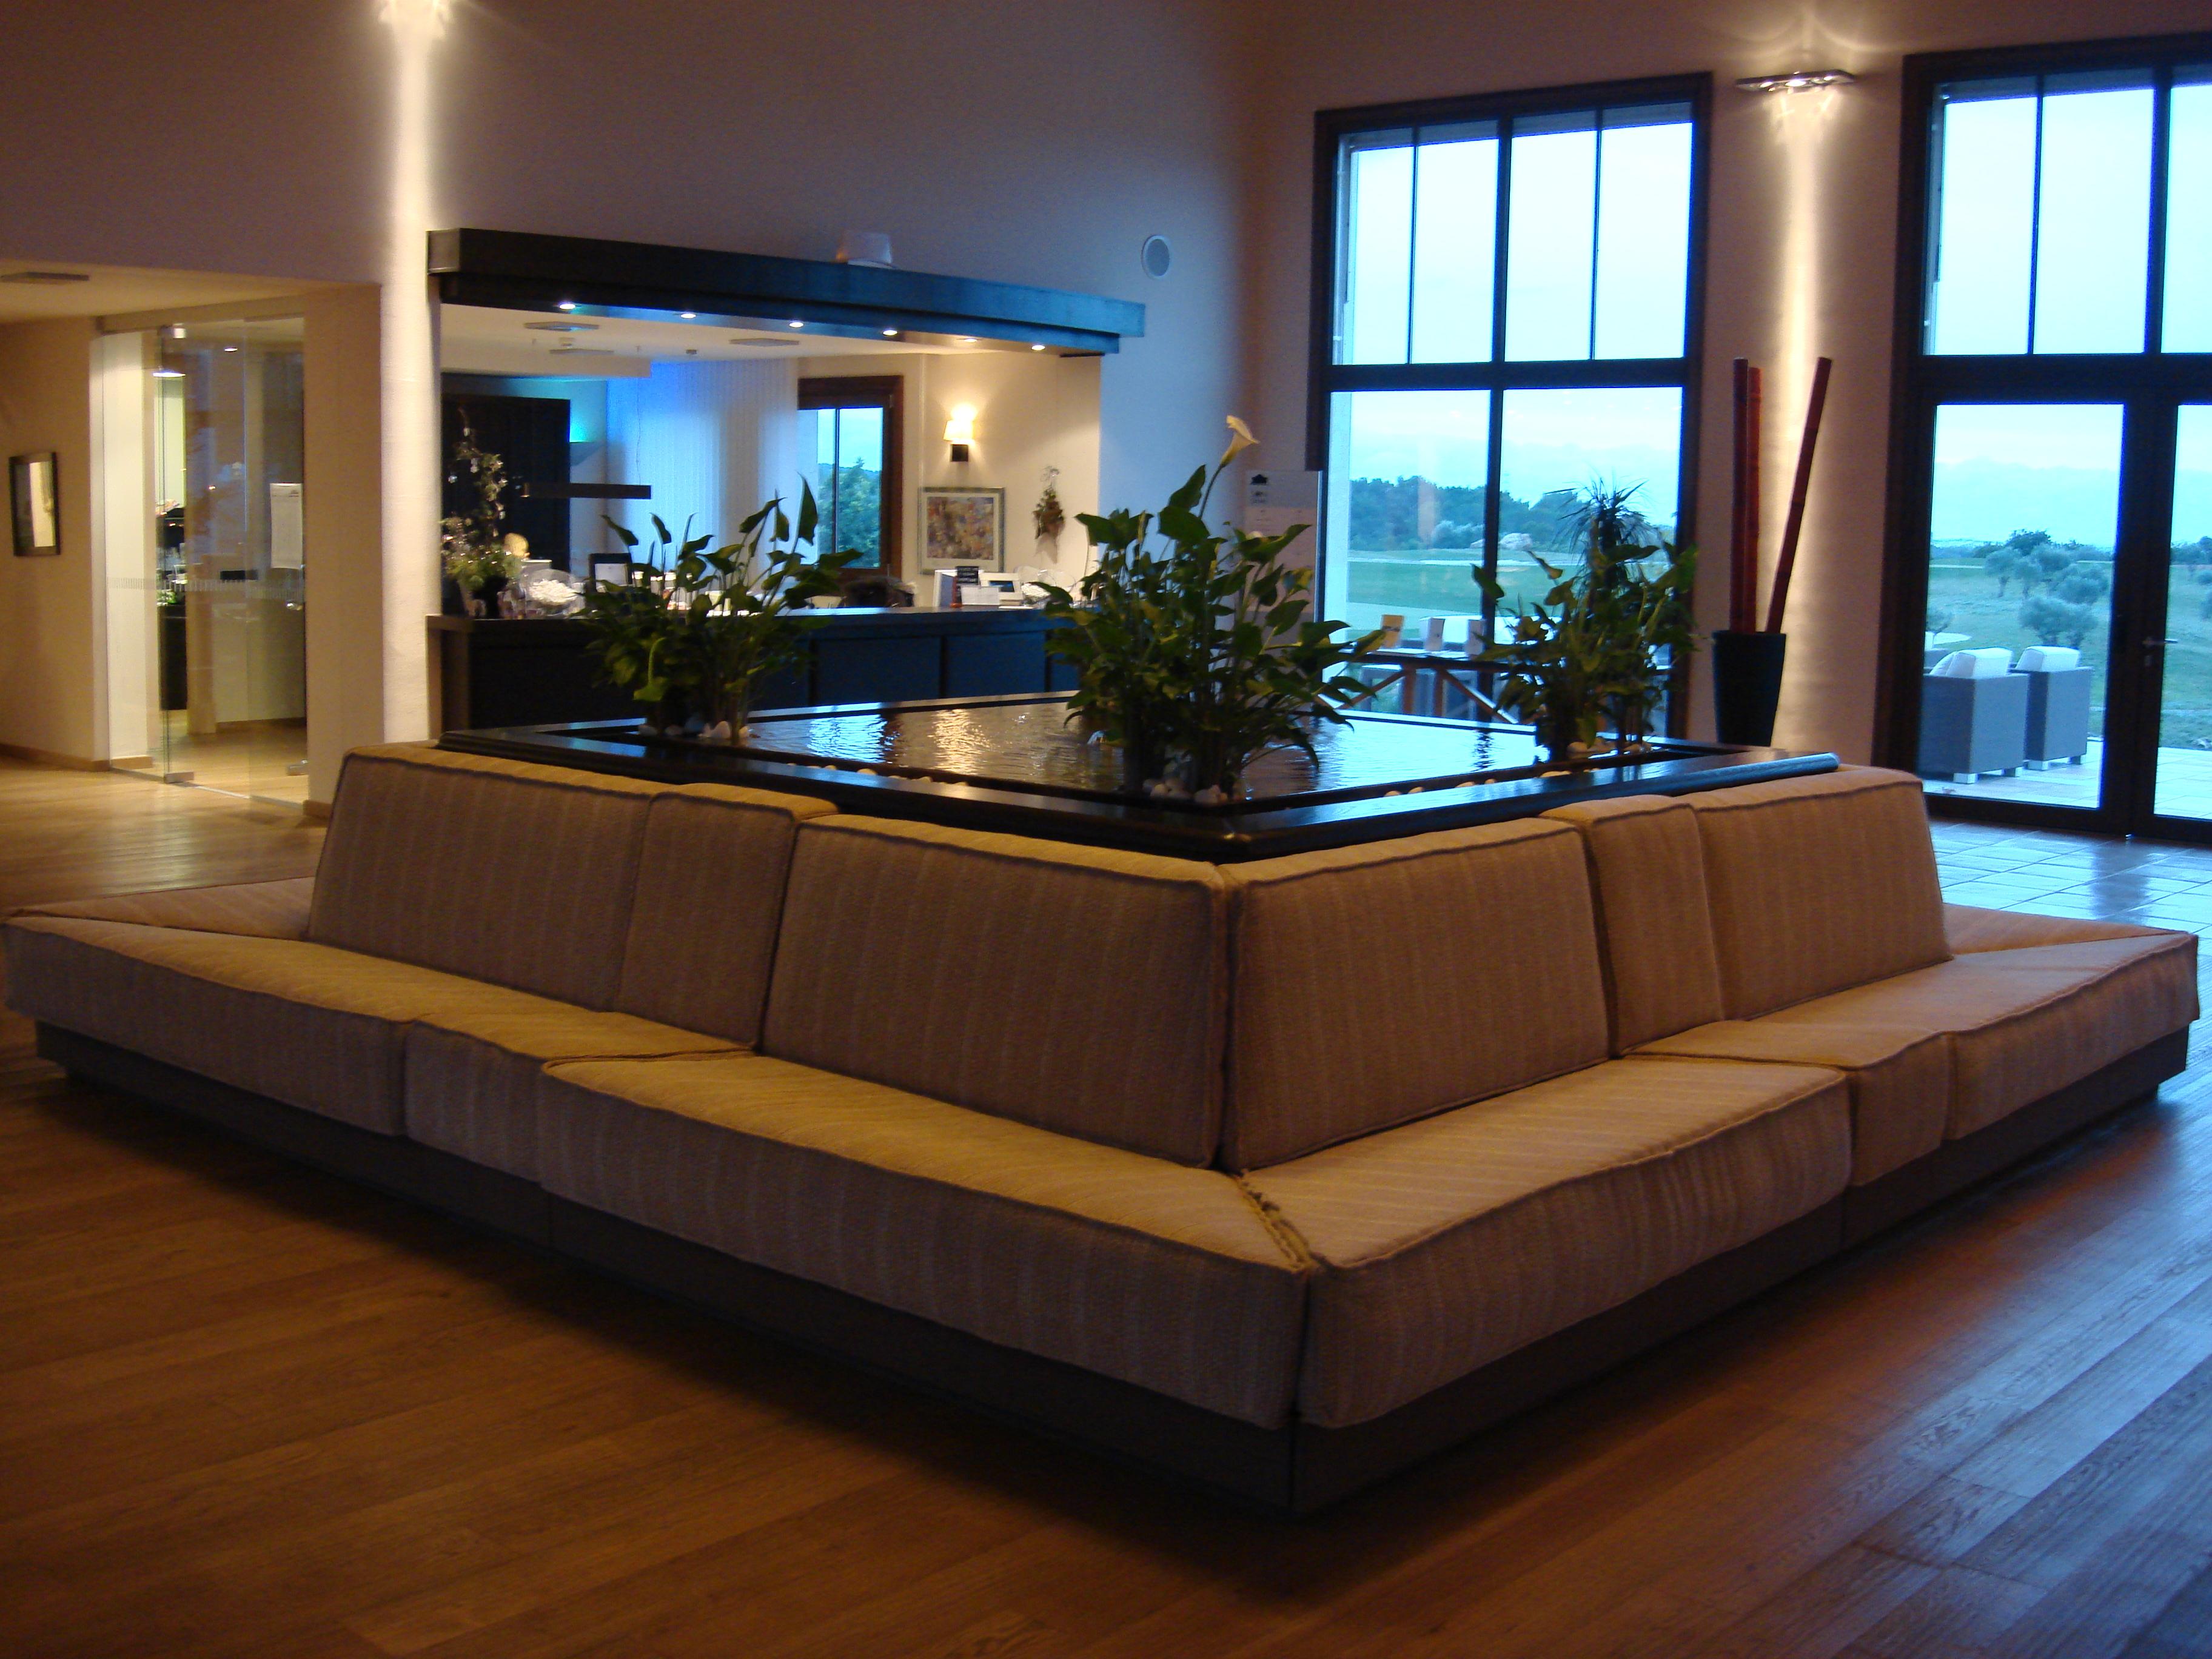 Interior Design Decoration And Furnishing At Son Gual Golf Club  # Muebles Hotel Mallorca